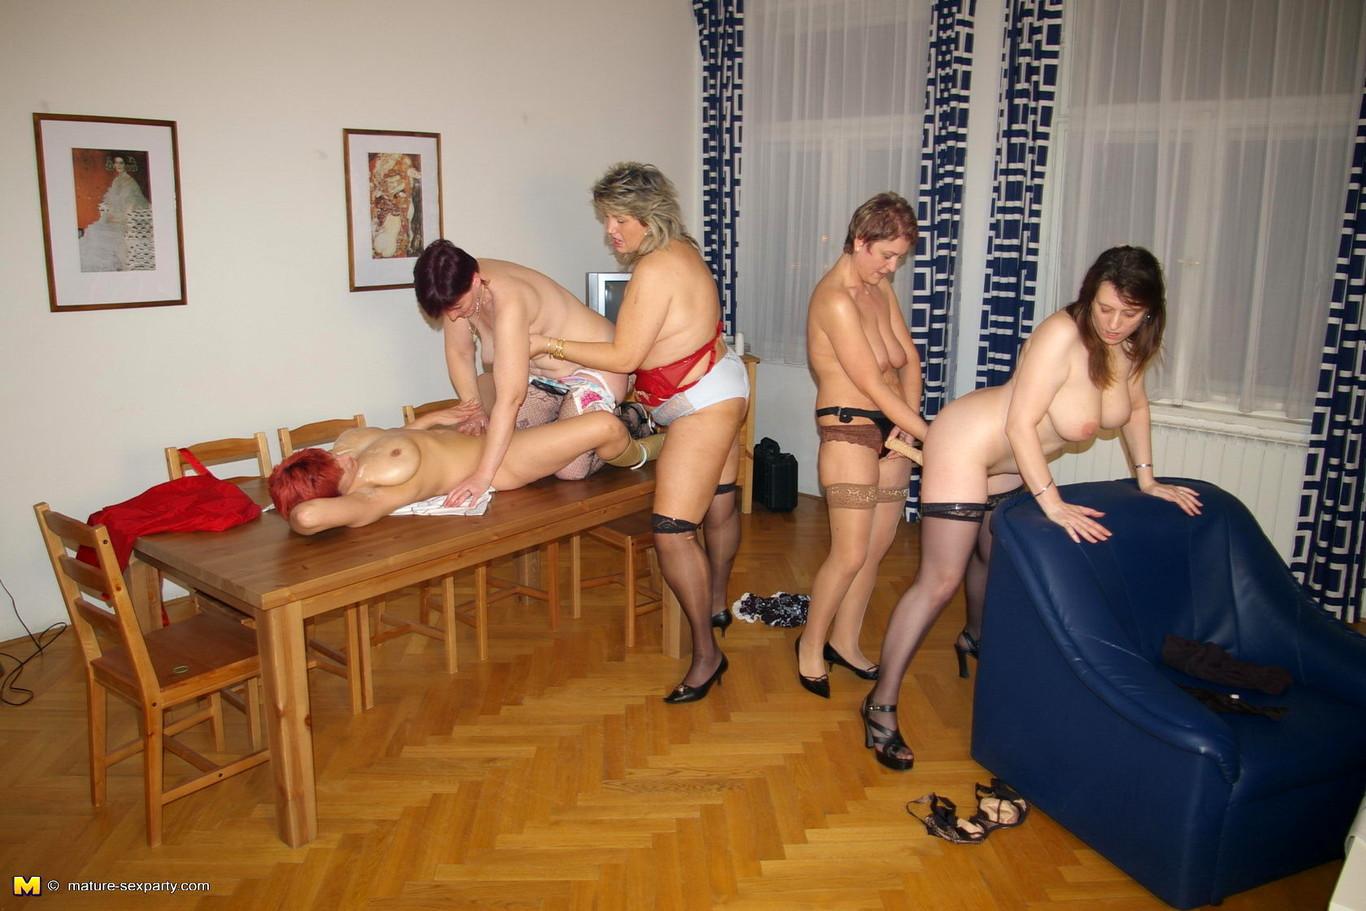 seksualnie-zrelie-zhenshini-razvlekayutsya-doma-foto-filmi-istoricheskie-fantastika-spisok-s-uklonom-porno